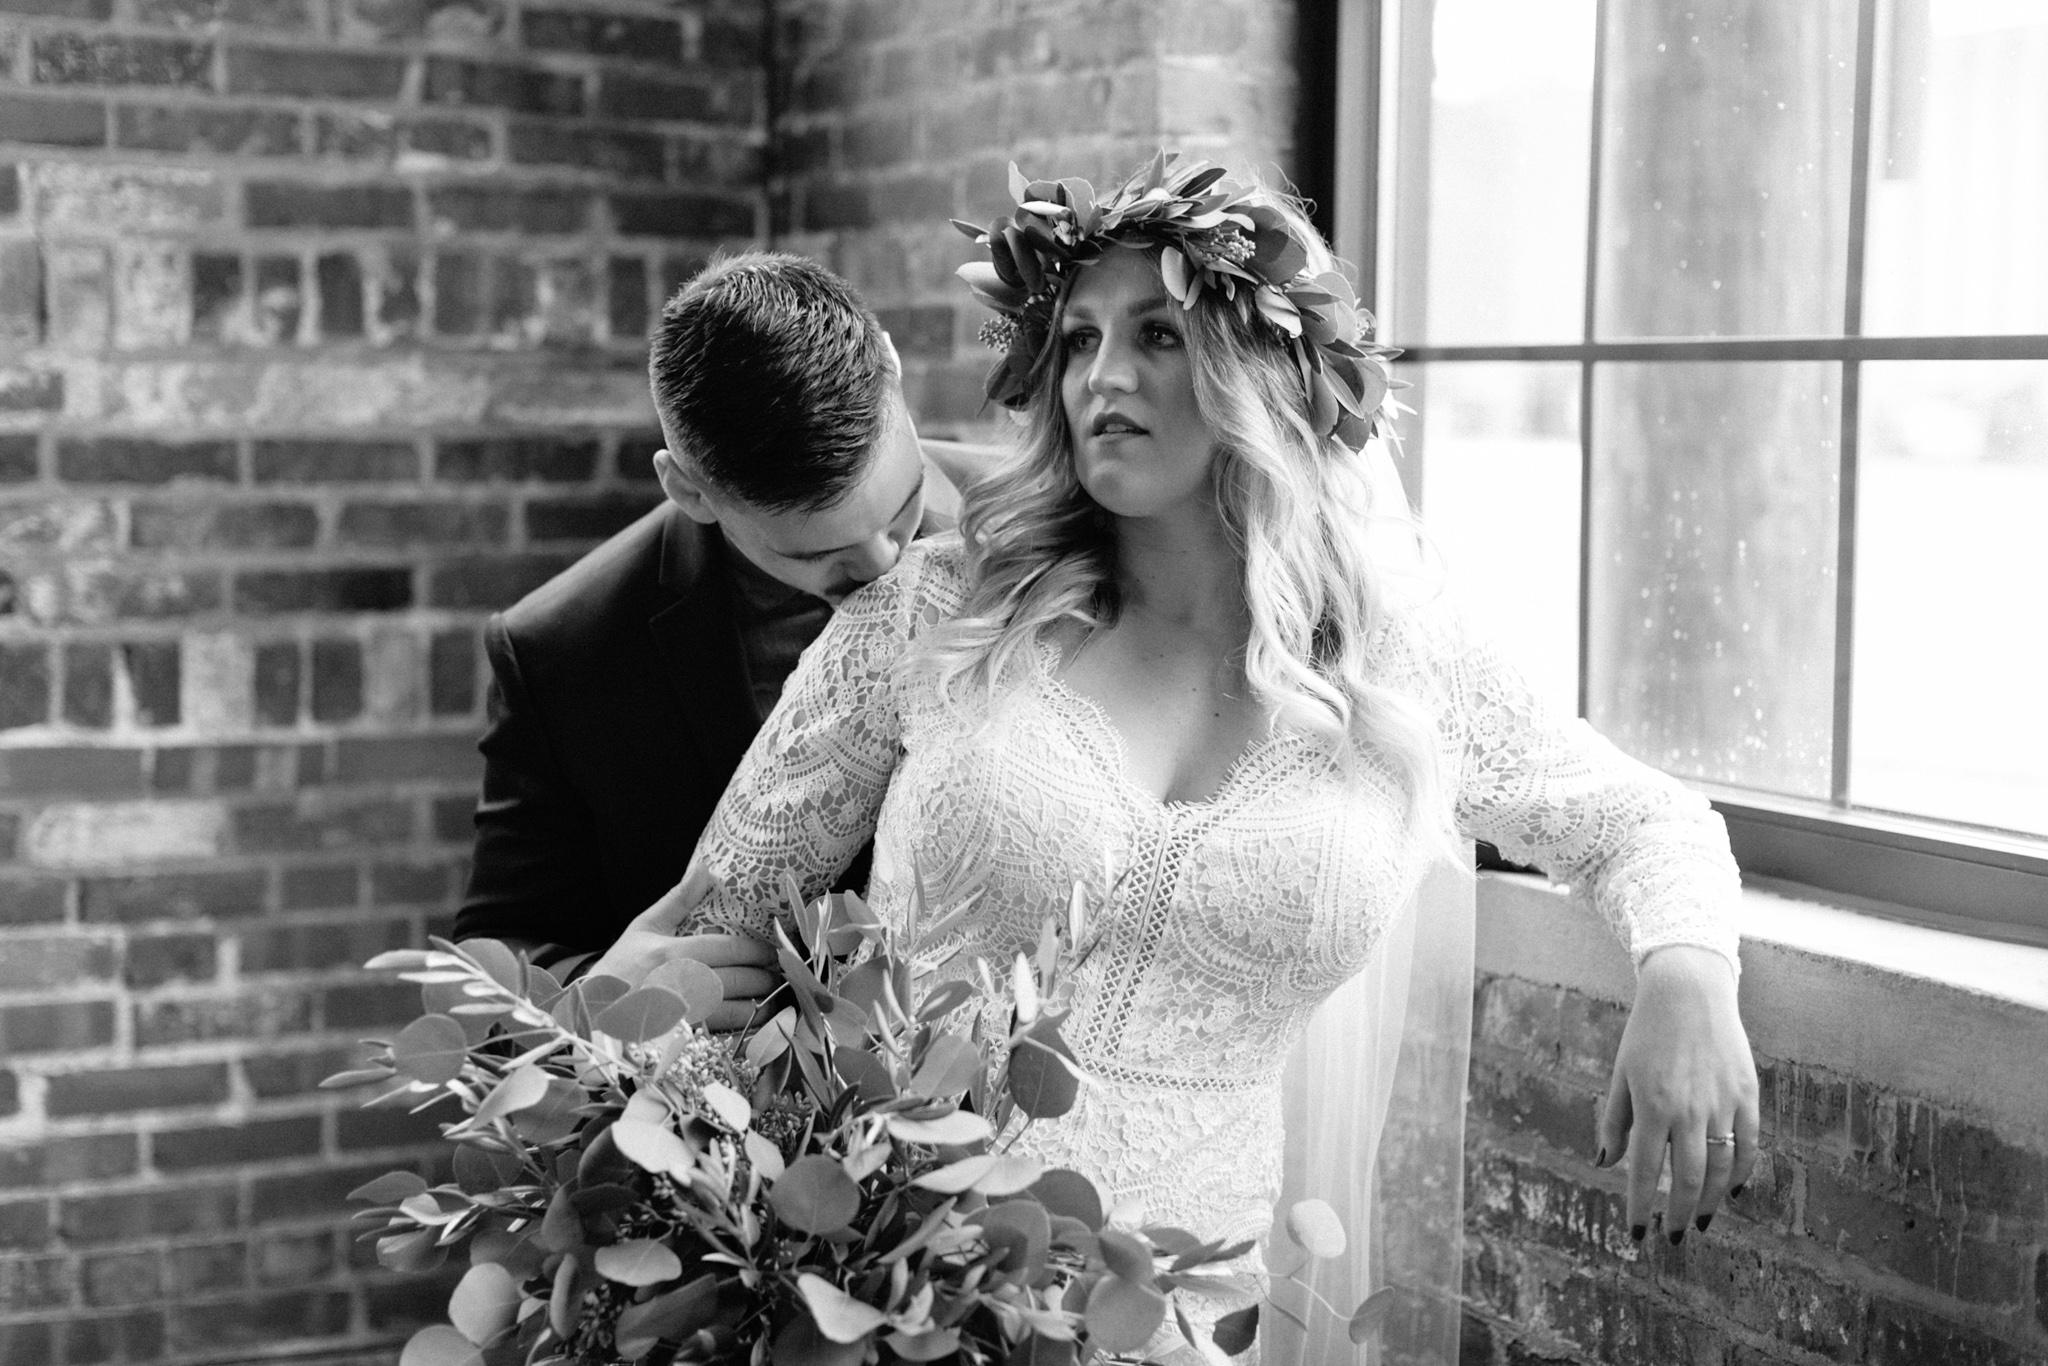 29_19-03-30 Caylen and Max Wedding Previews-65.jpg